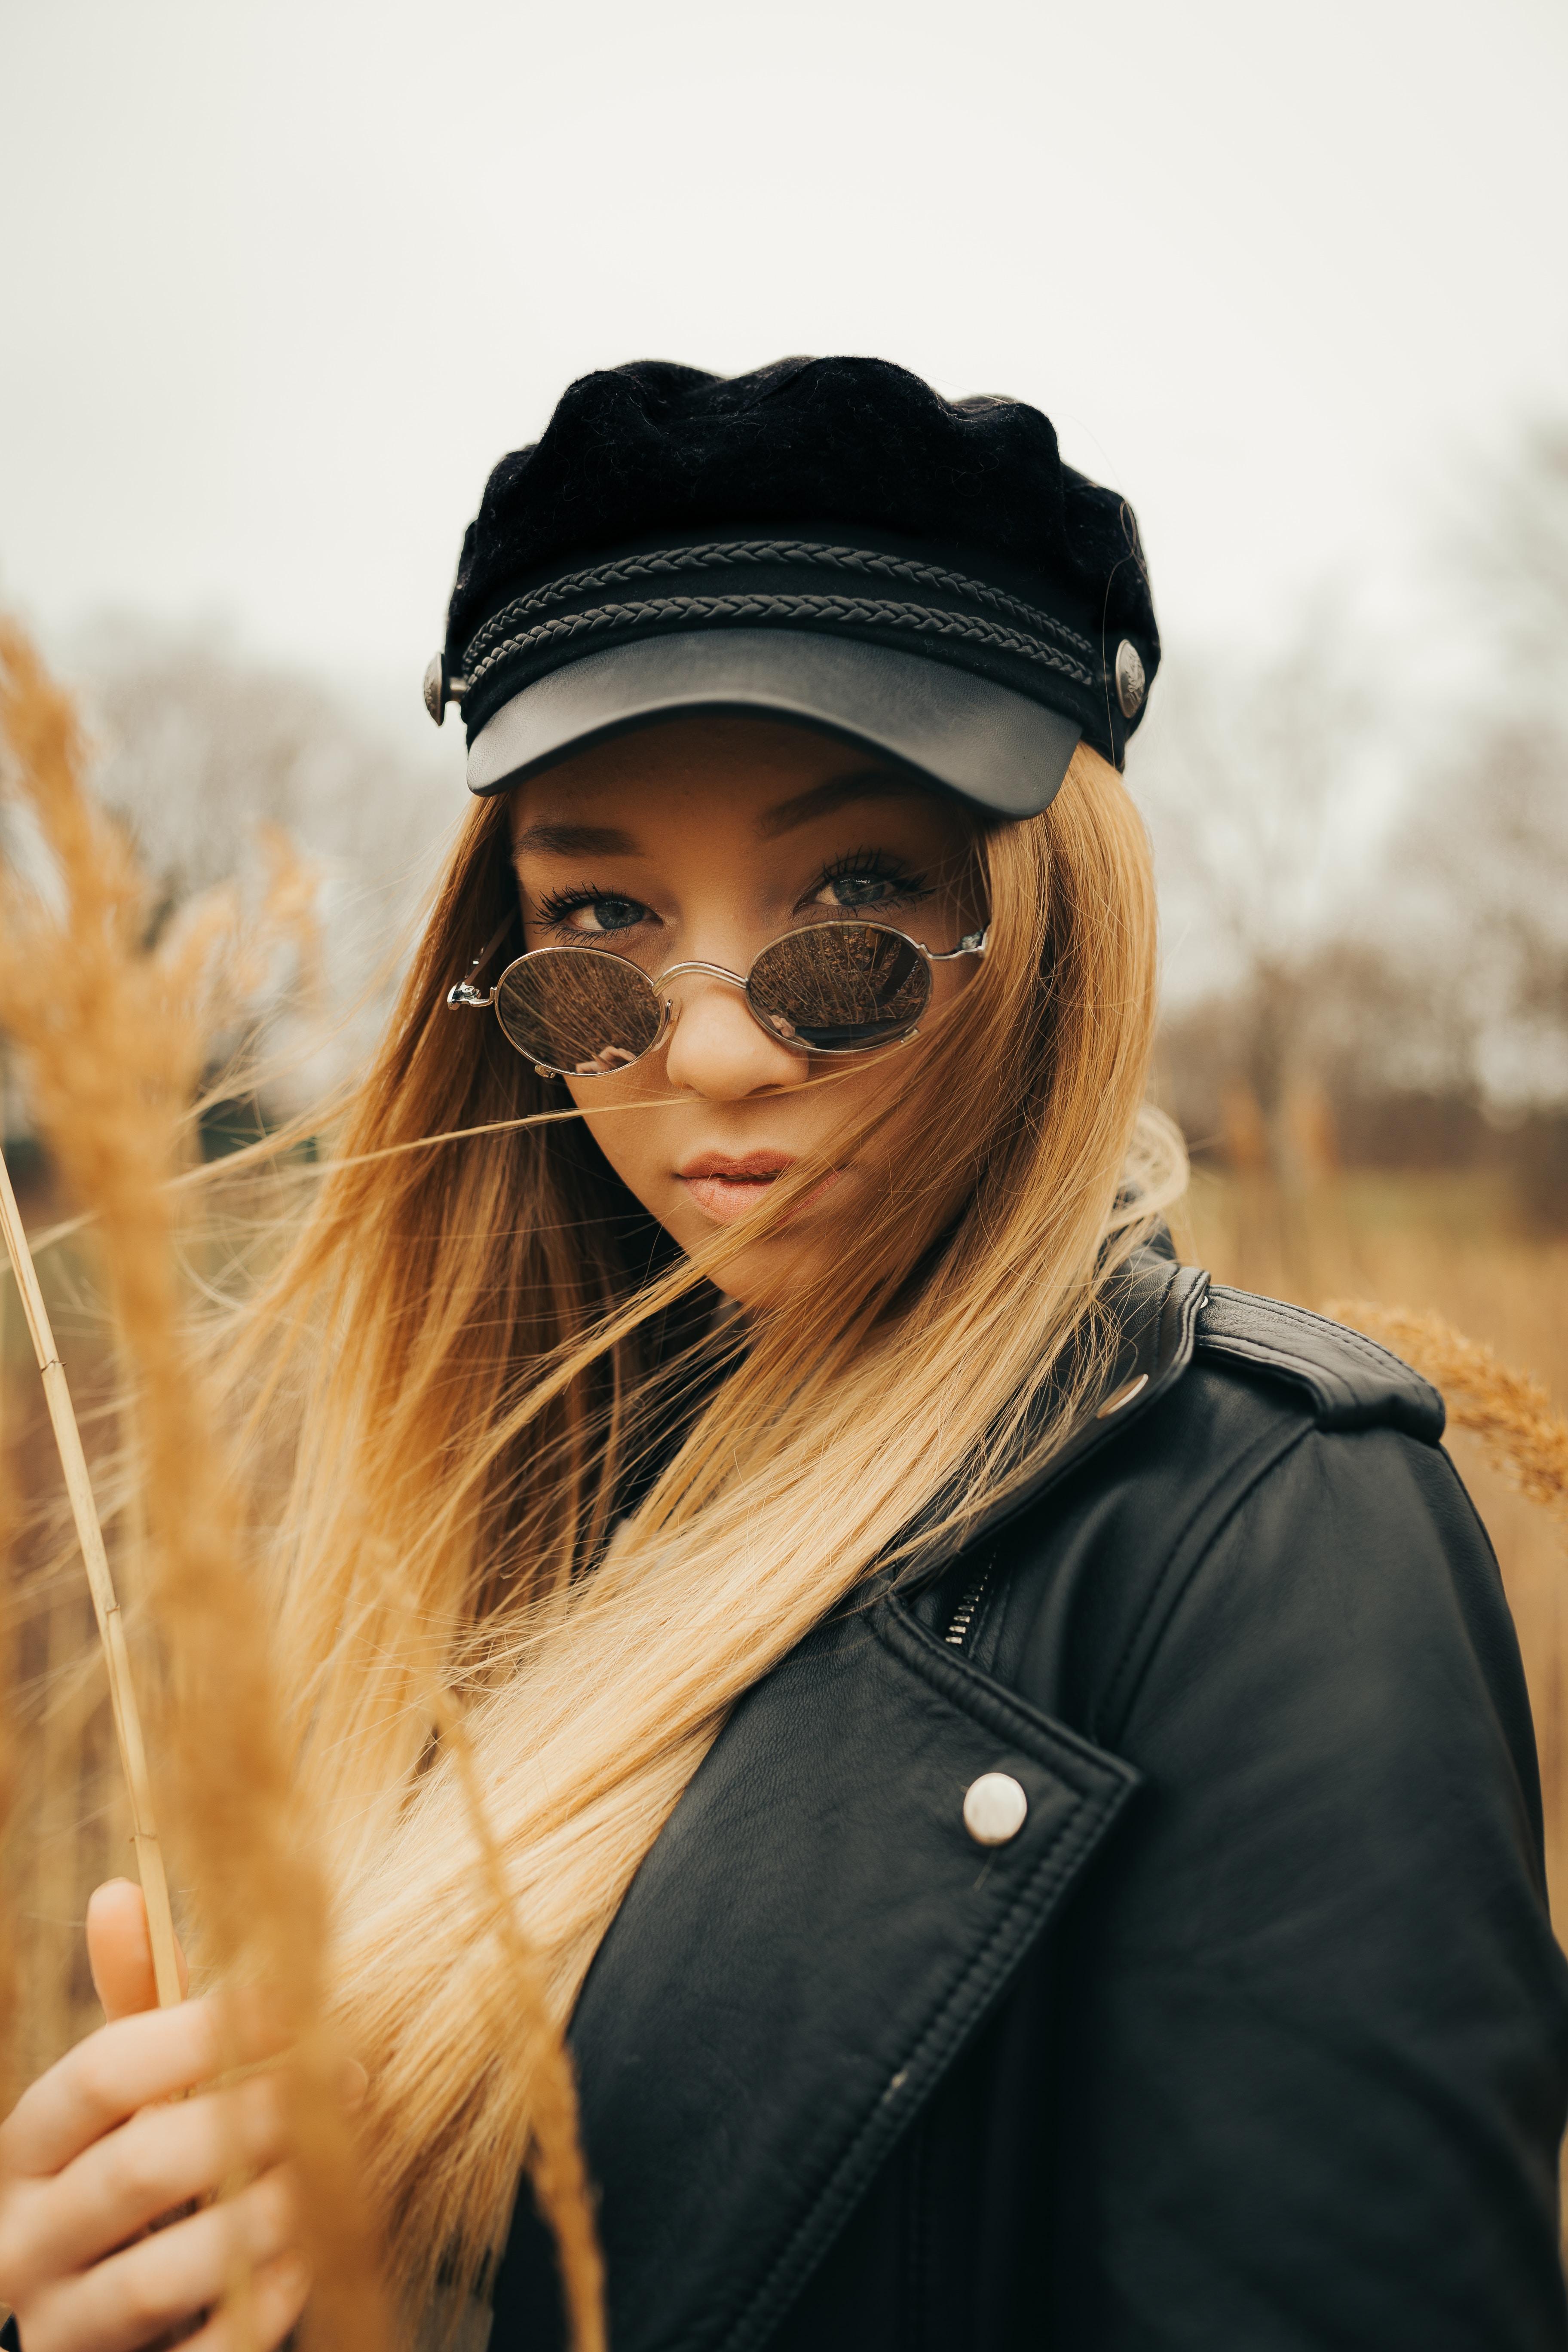 woman wearing sunglasses and holding stick